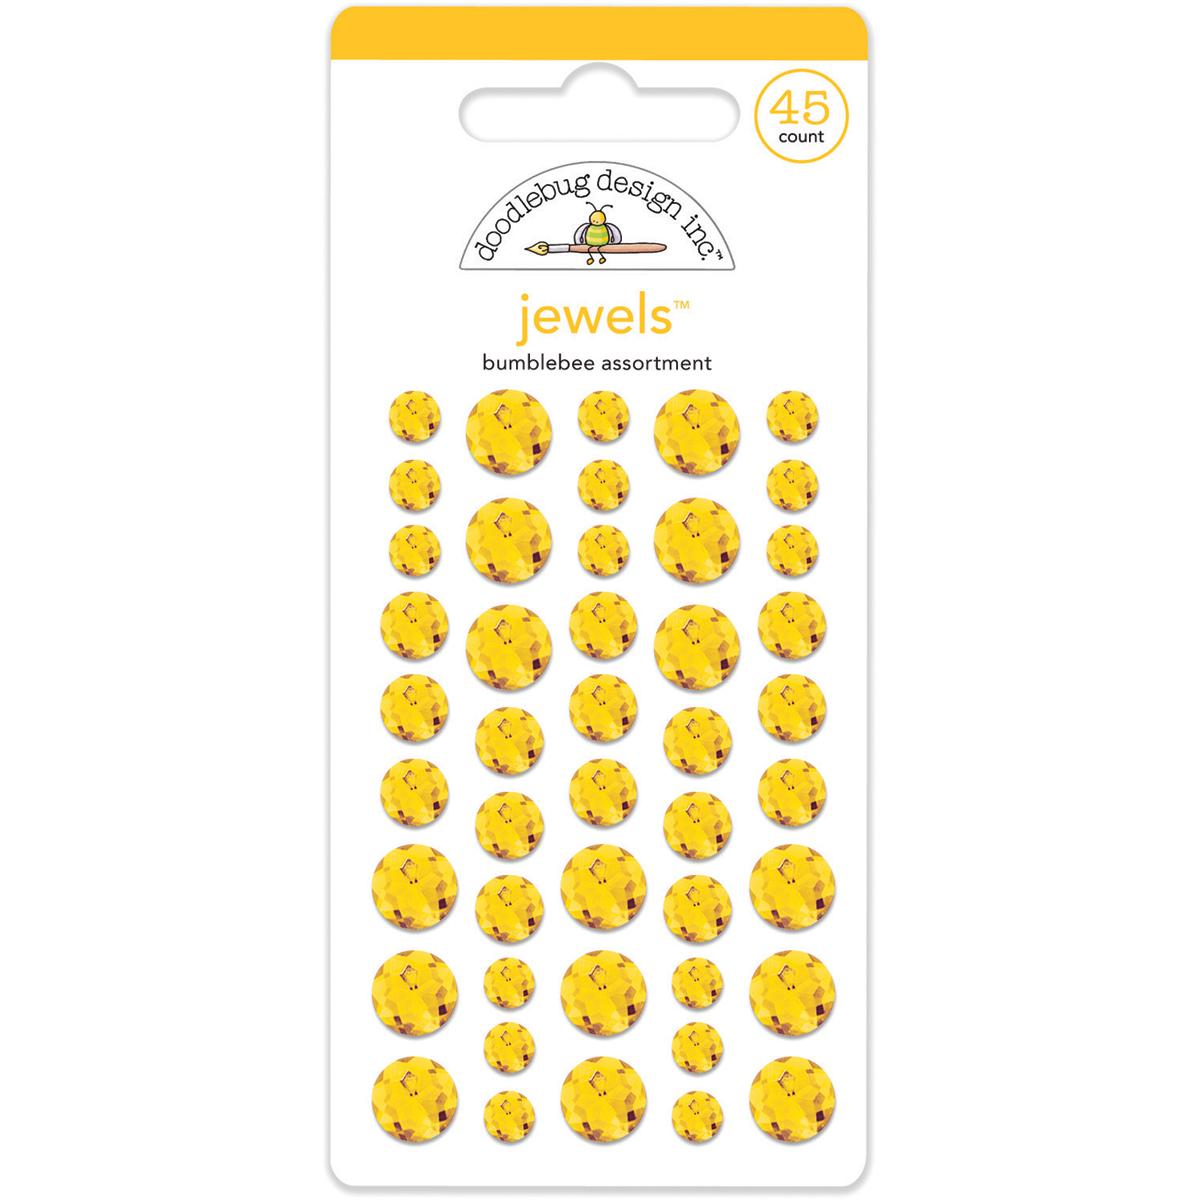 Doodlebug Adhesive Jewels 6mm, 8mm & 10mm 45/Pkg-Bumblebee